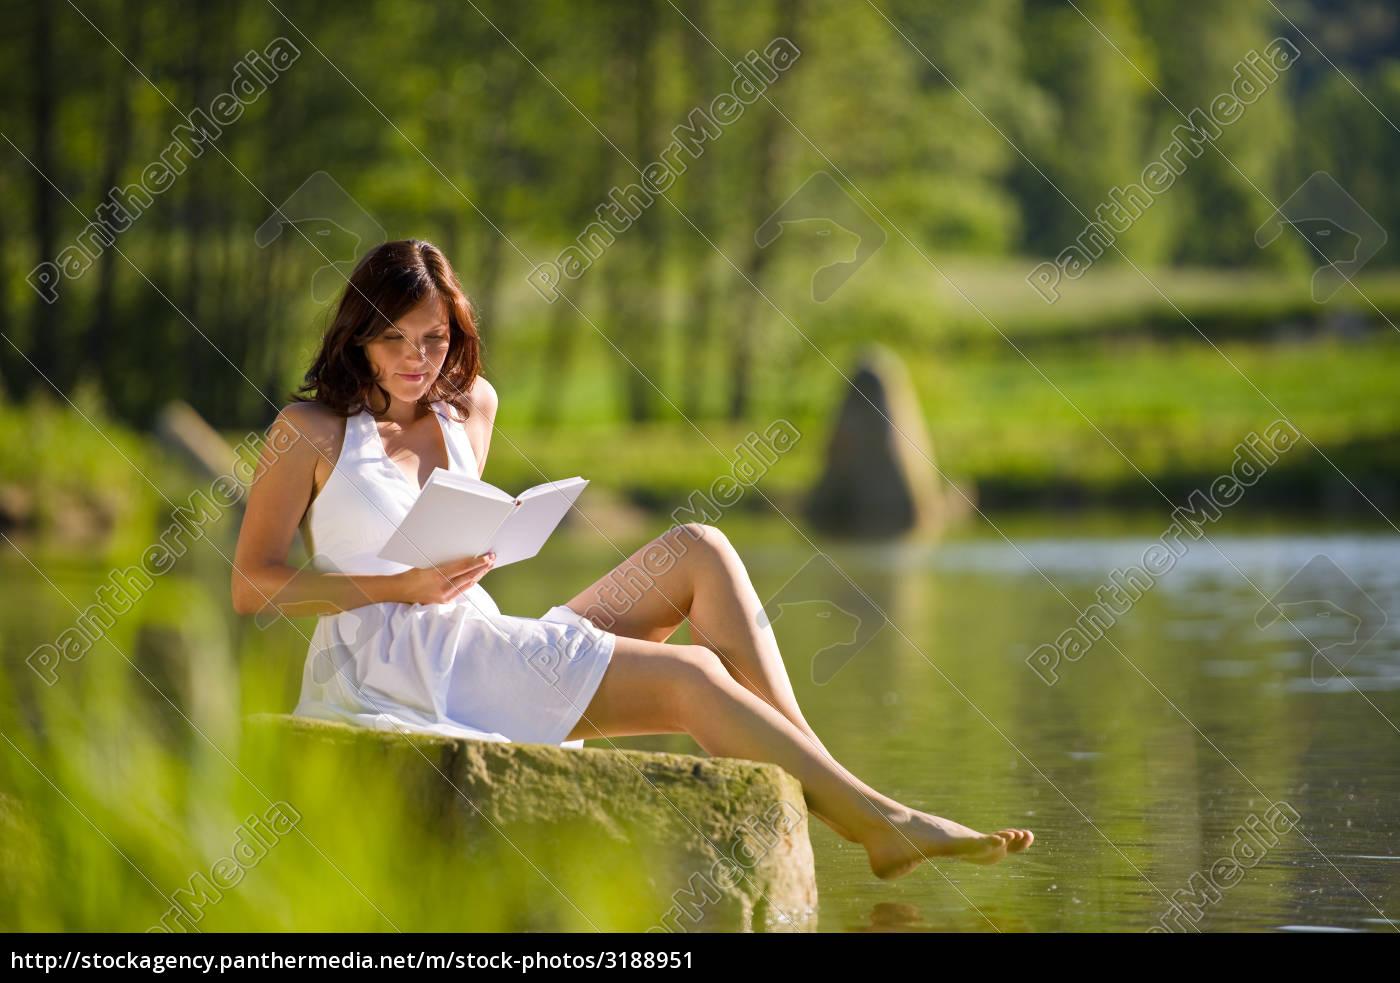 happy, romantic, woman, sitting, by, lake - 3188951